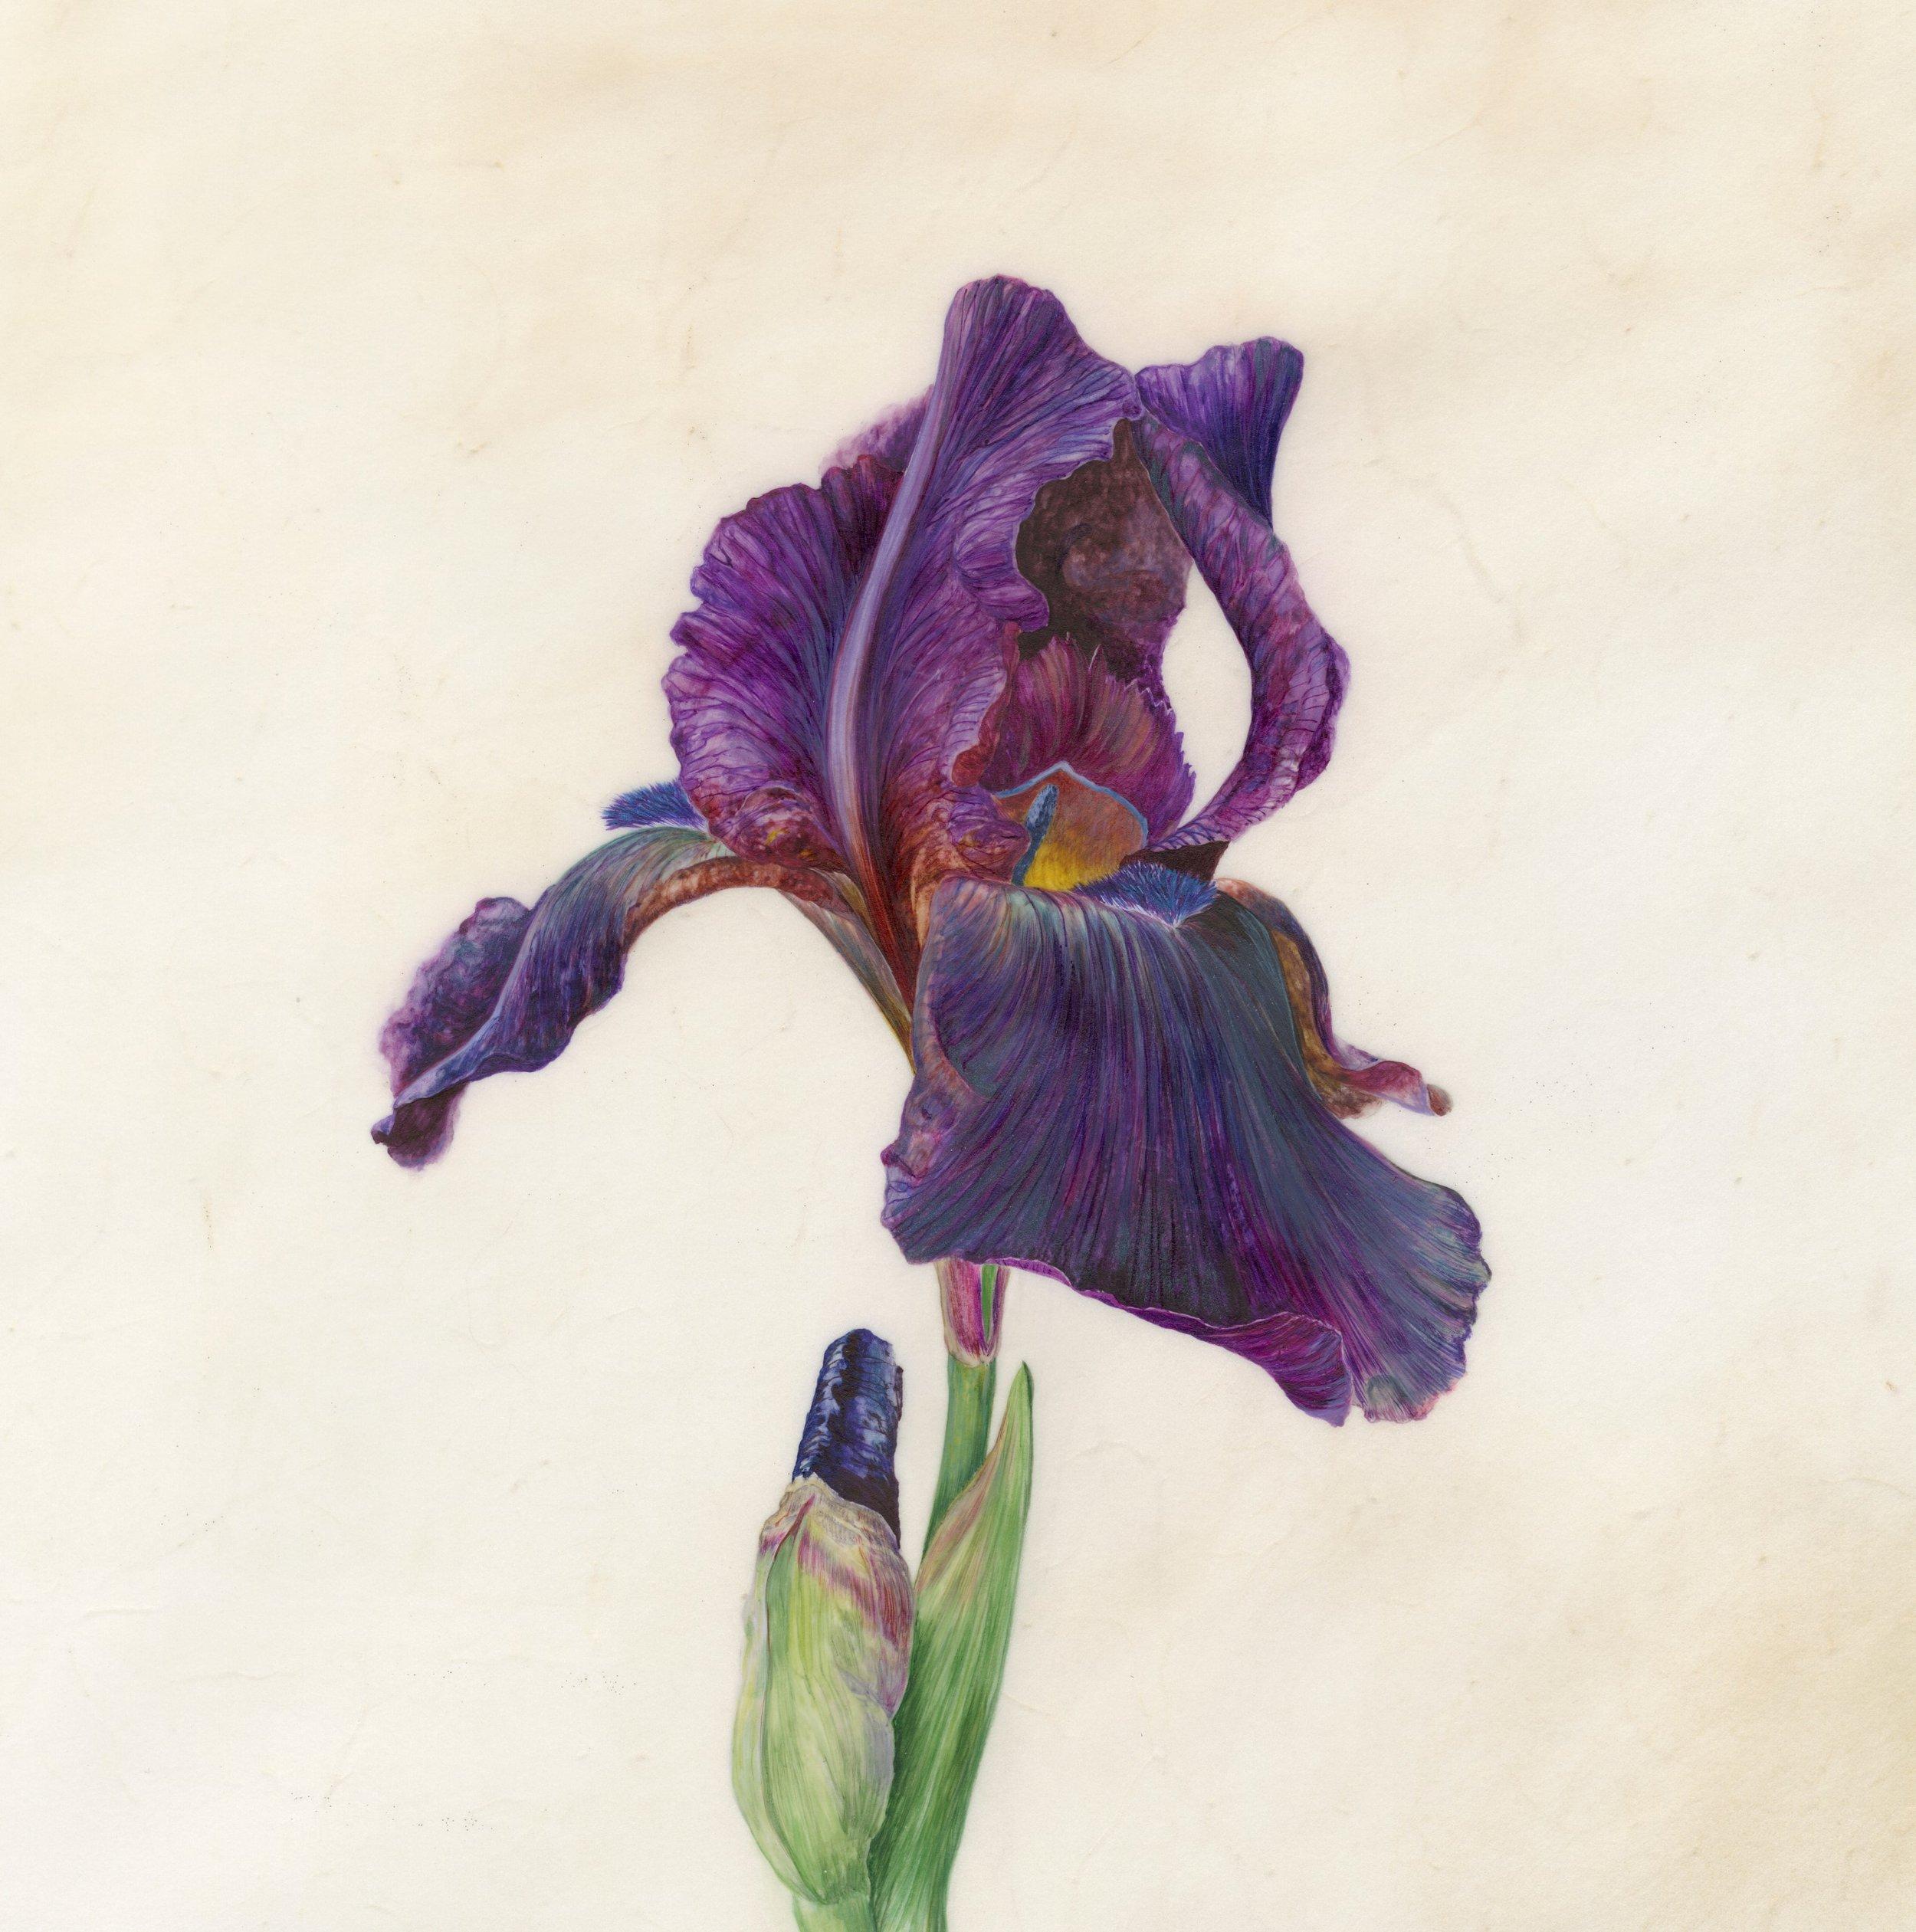 Iris Recognition VI Superstition  Watercolour on vellum  45 x 45cm framed  21.5 x 21.5cm image  £720 framed